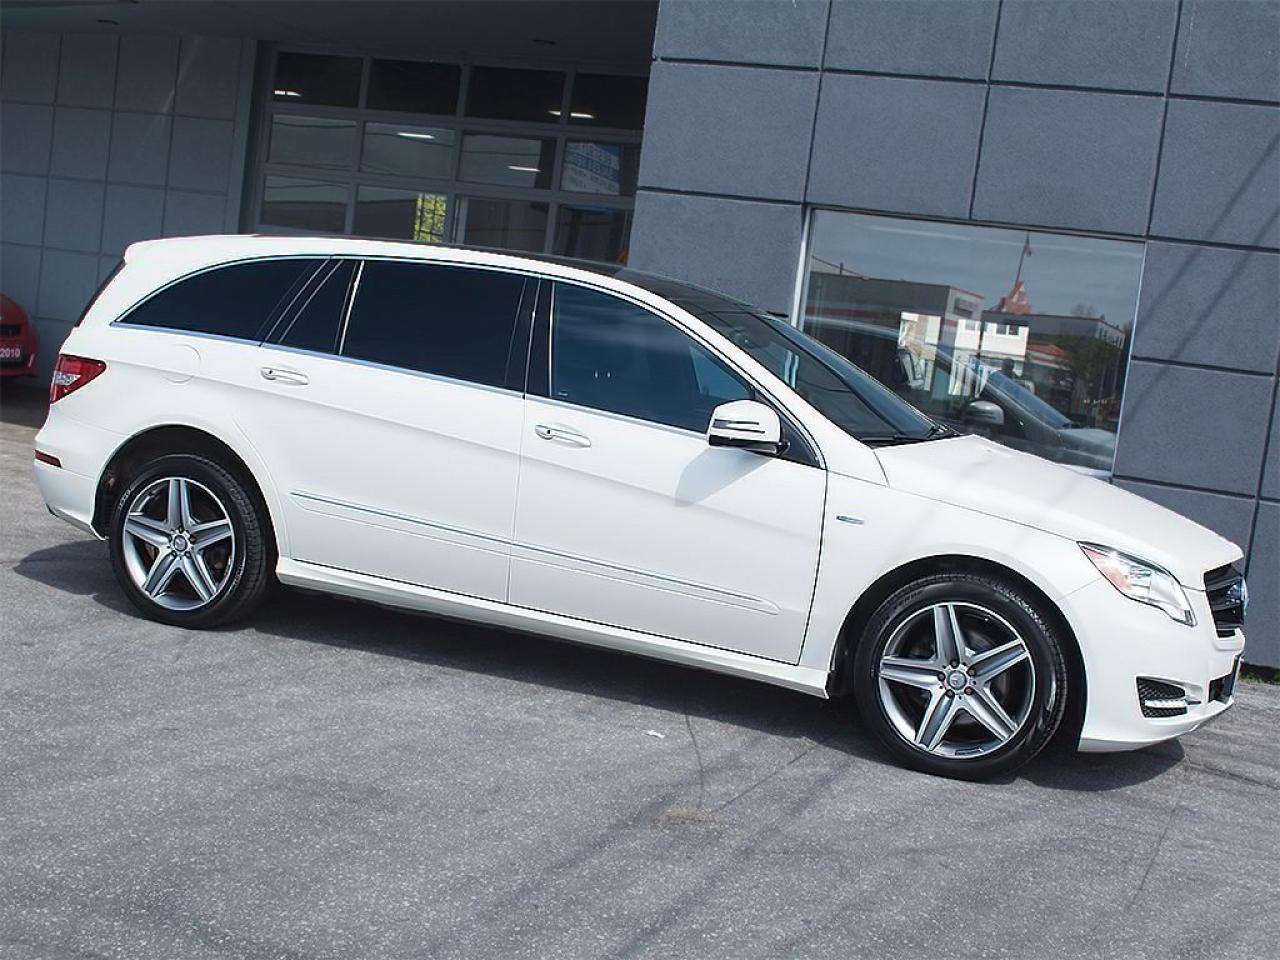 Photo of White 2012 Mercedes-Benz R 350